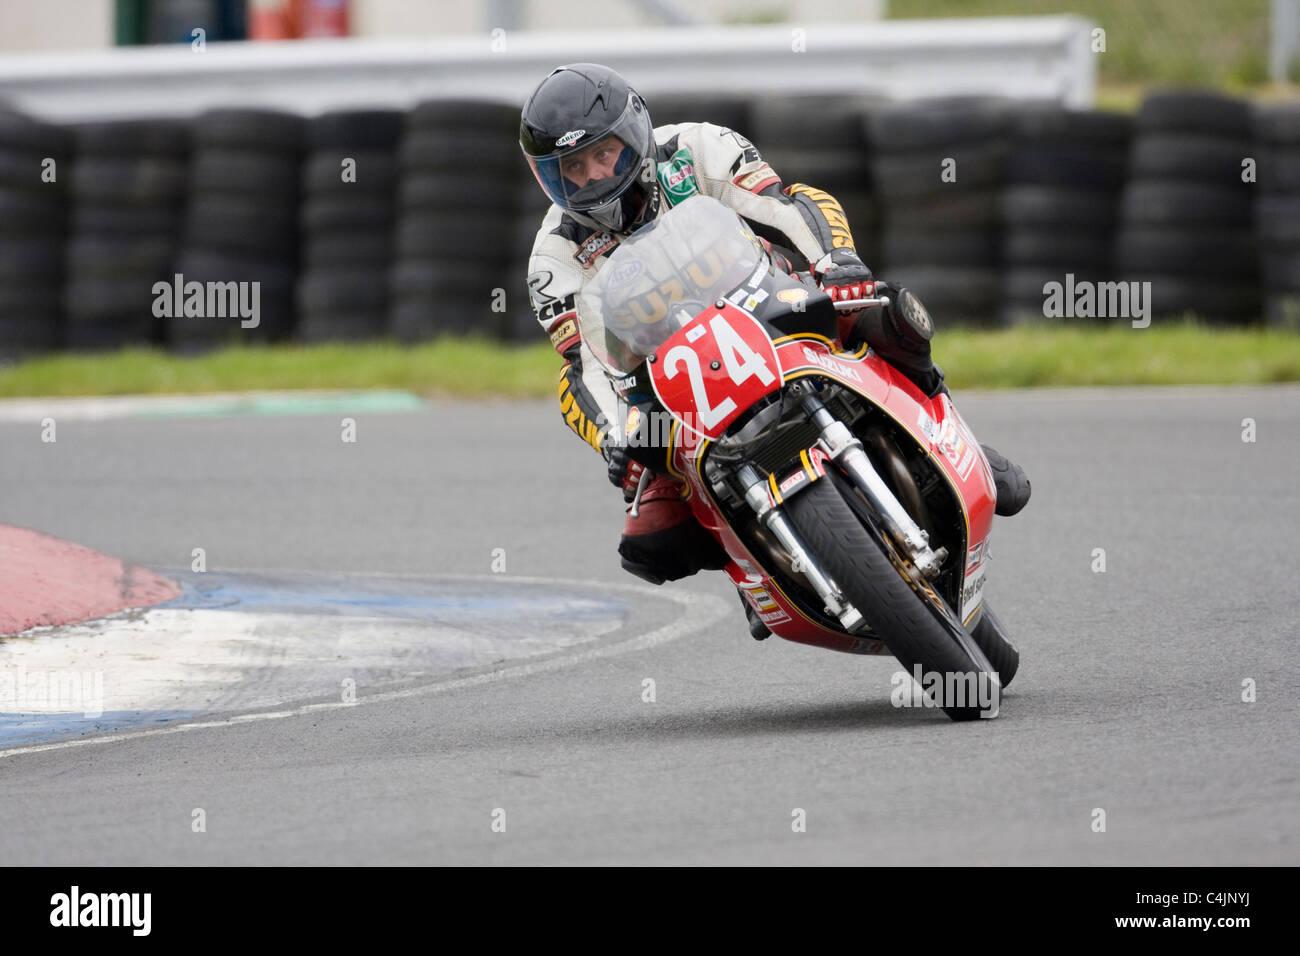 Yamaha FZ 599cc ridden by Paul Wood - Stock Image